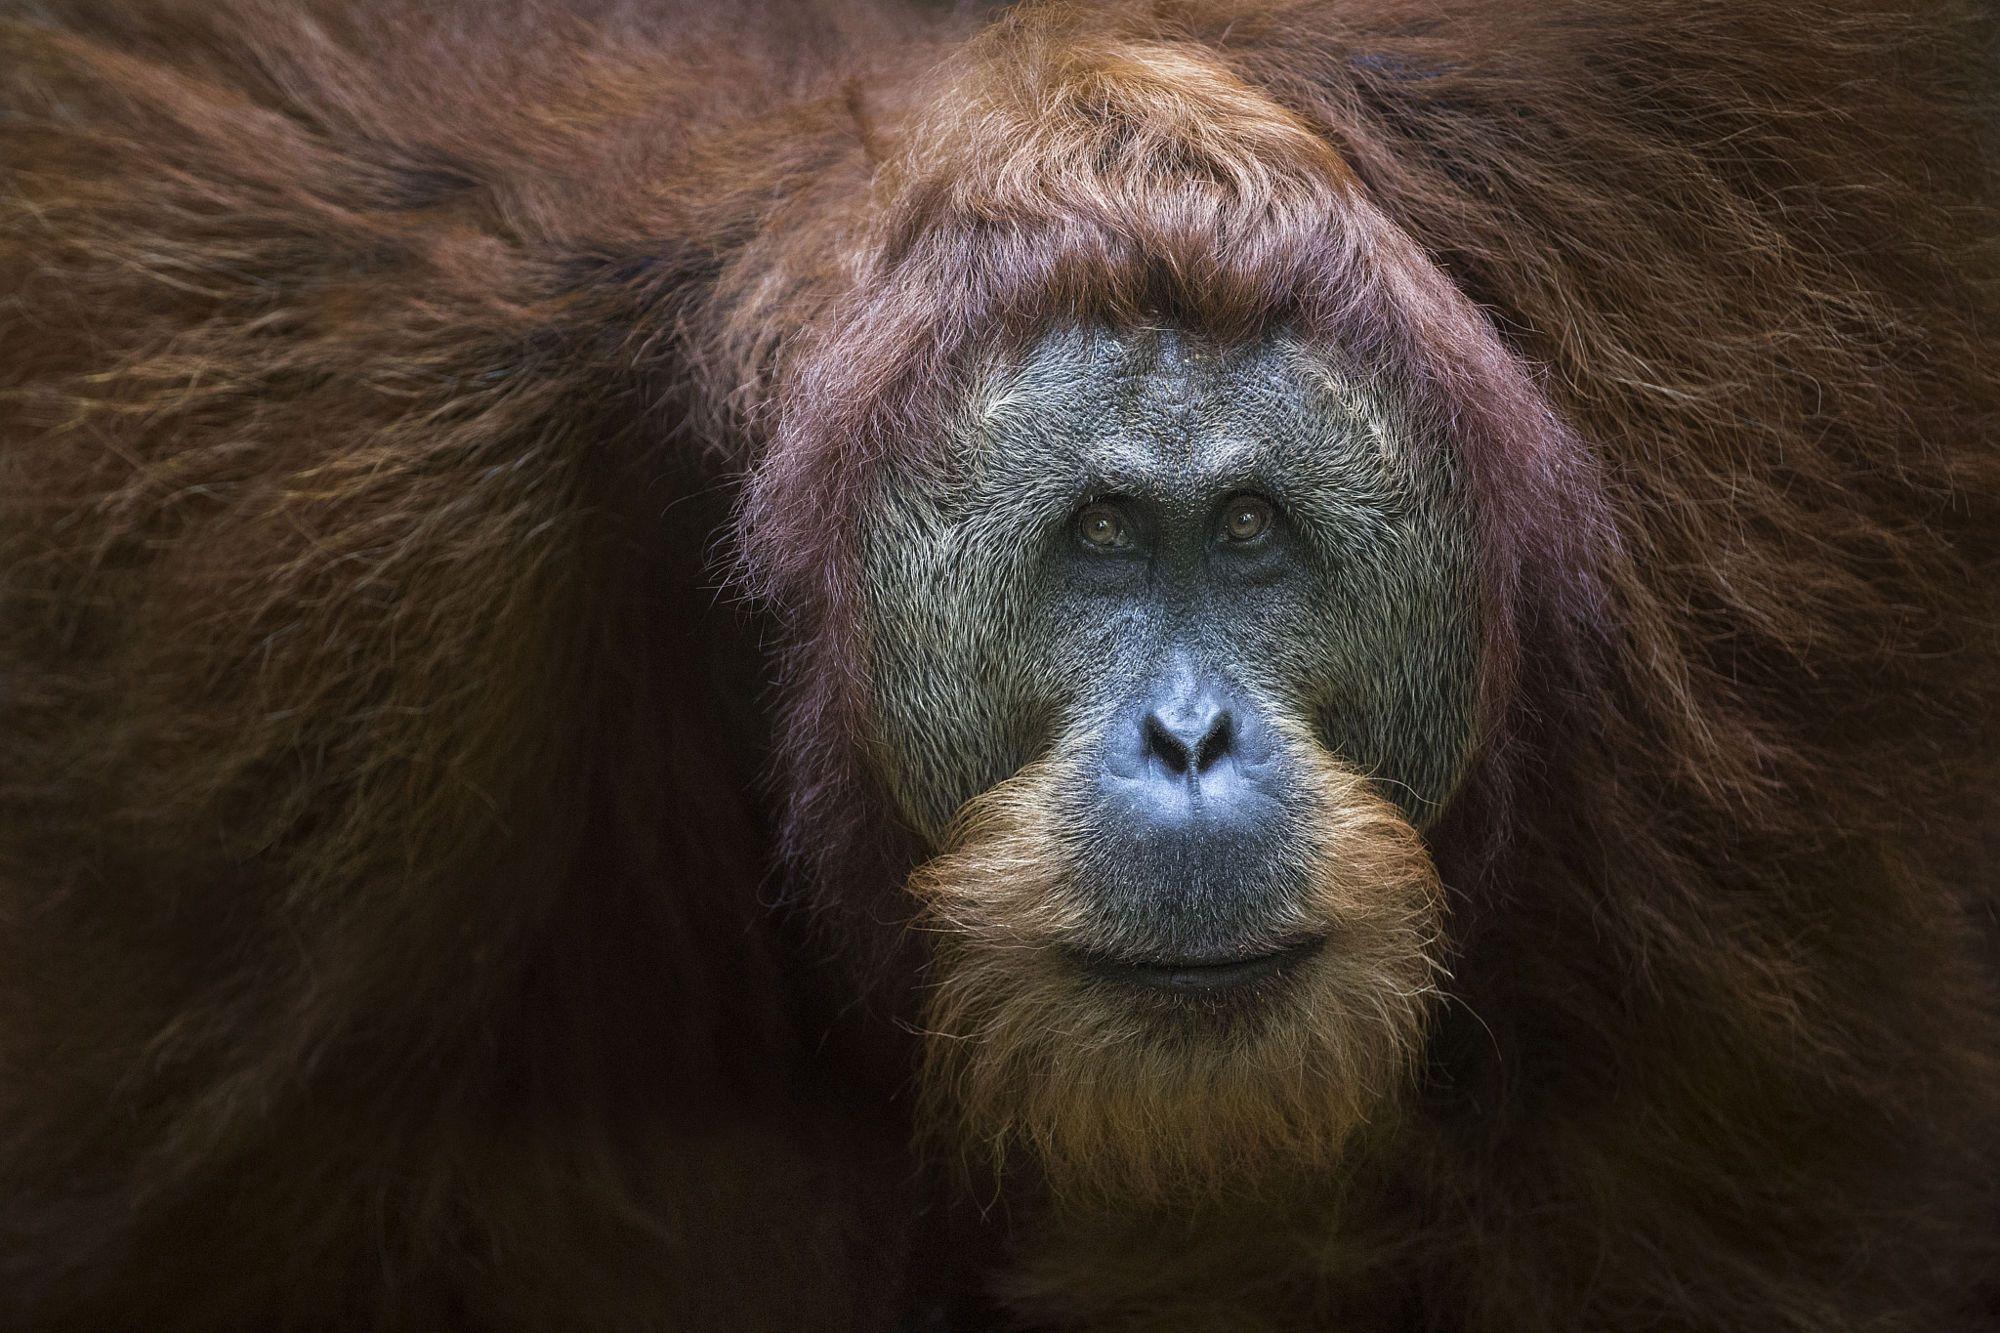 Male orangutan by Ian Plant - Photo 159163593 - 500px